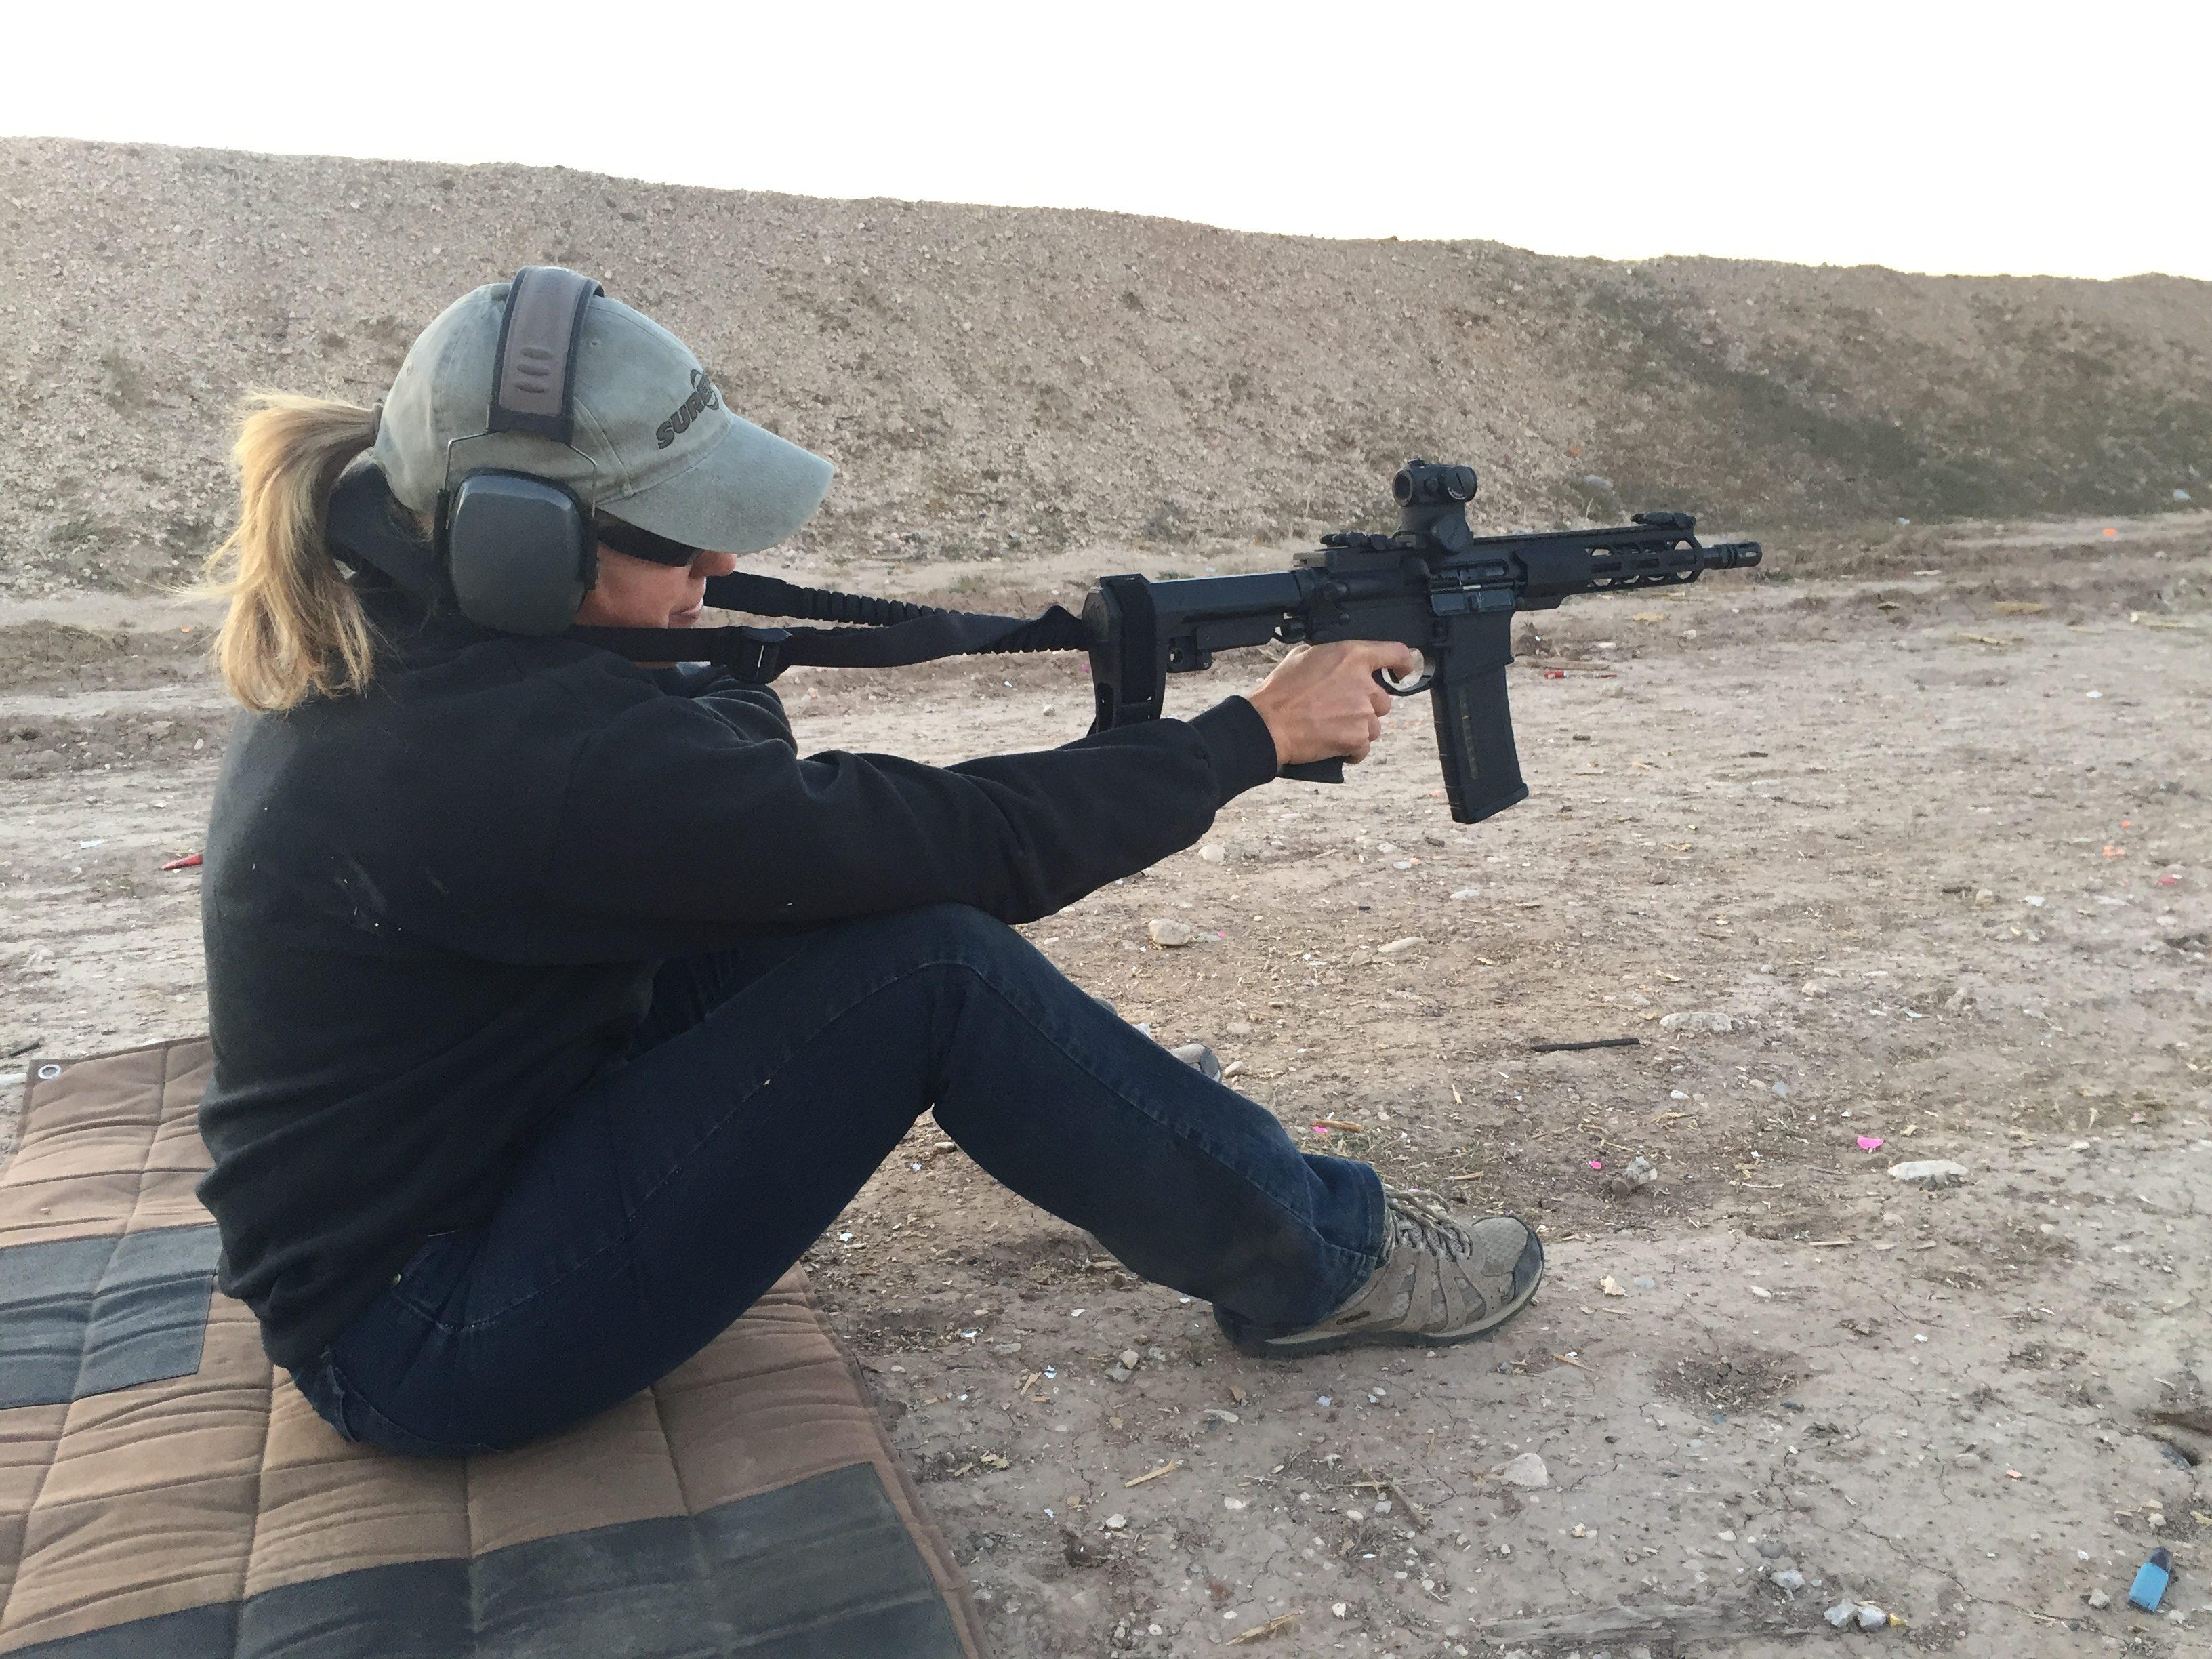 Windham Weaponry RP9SFS-7 5